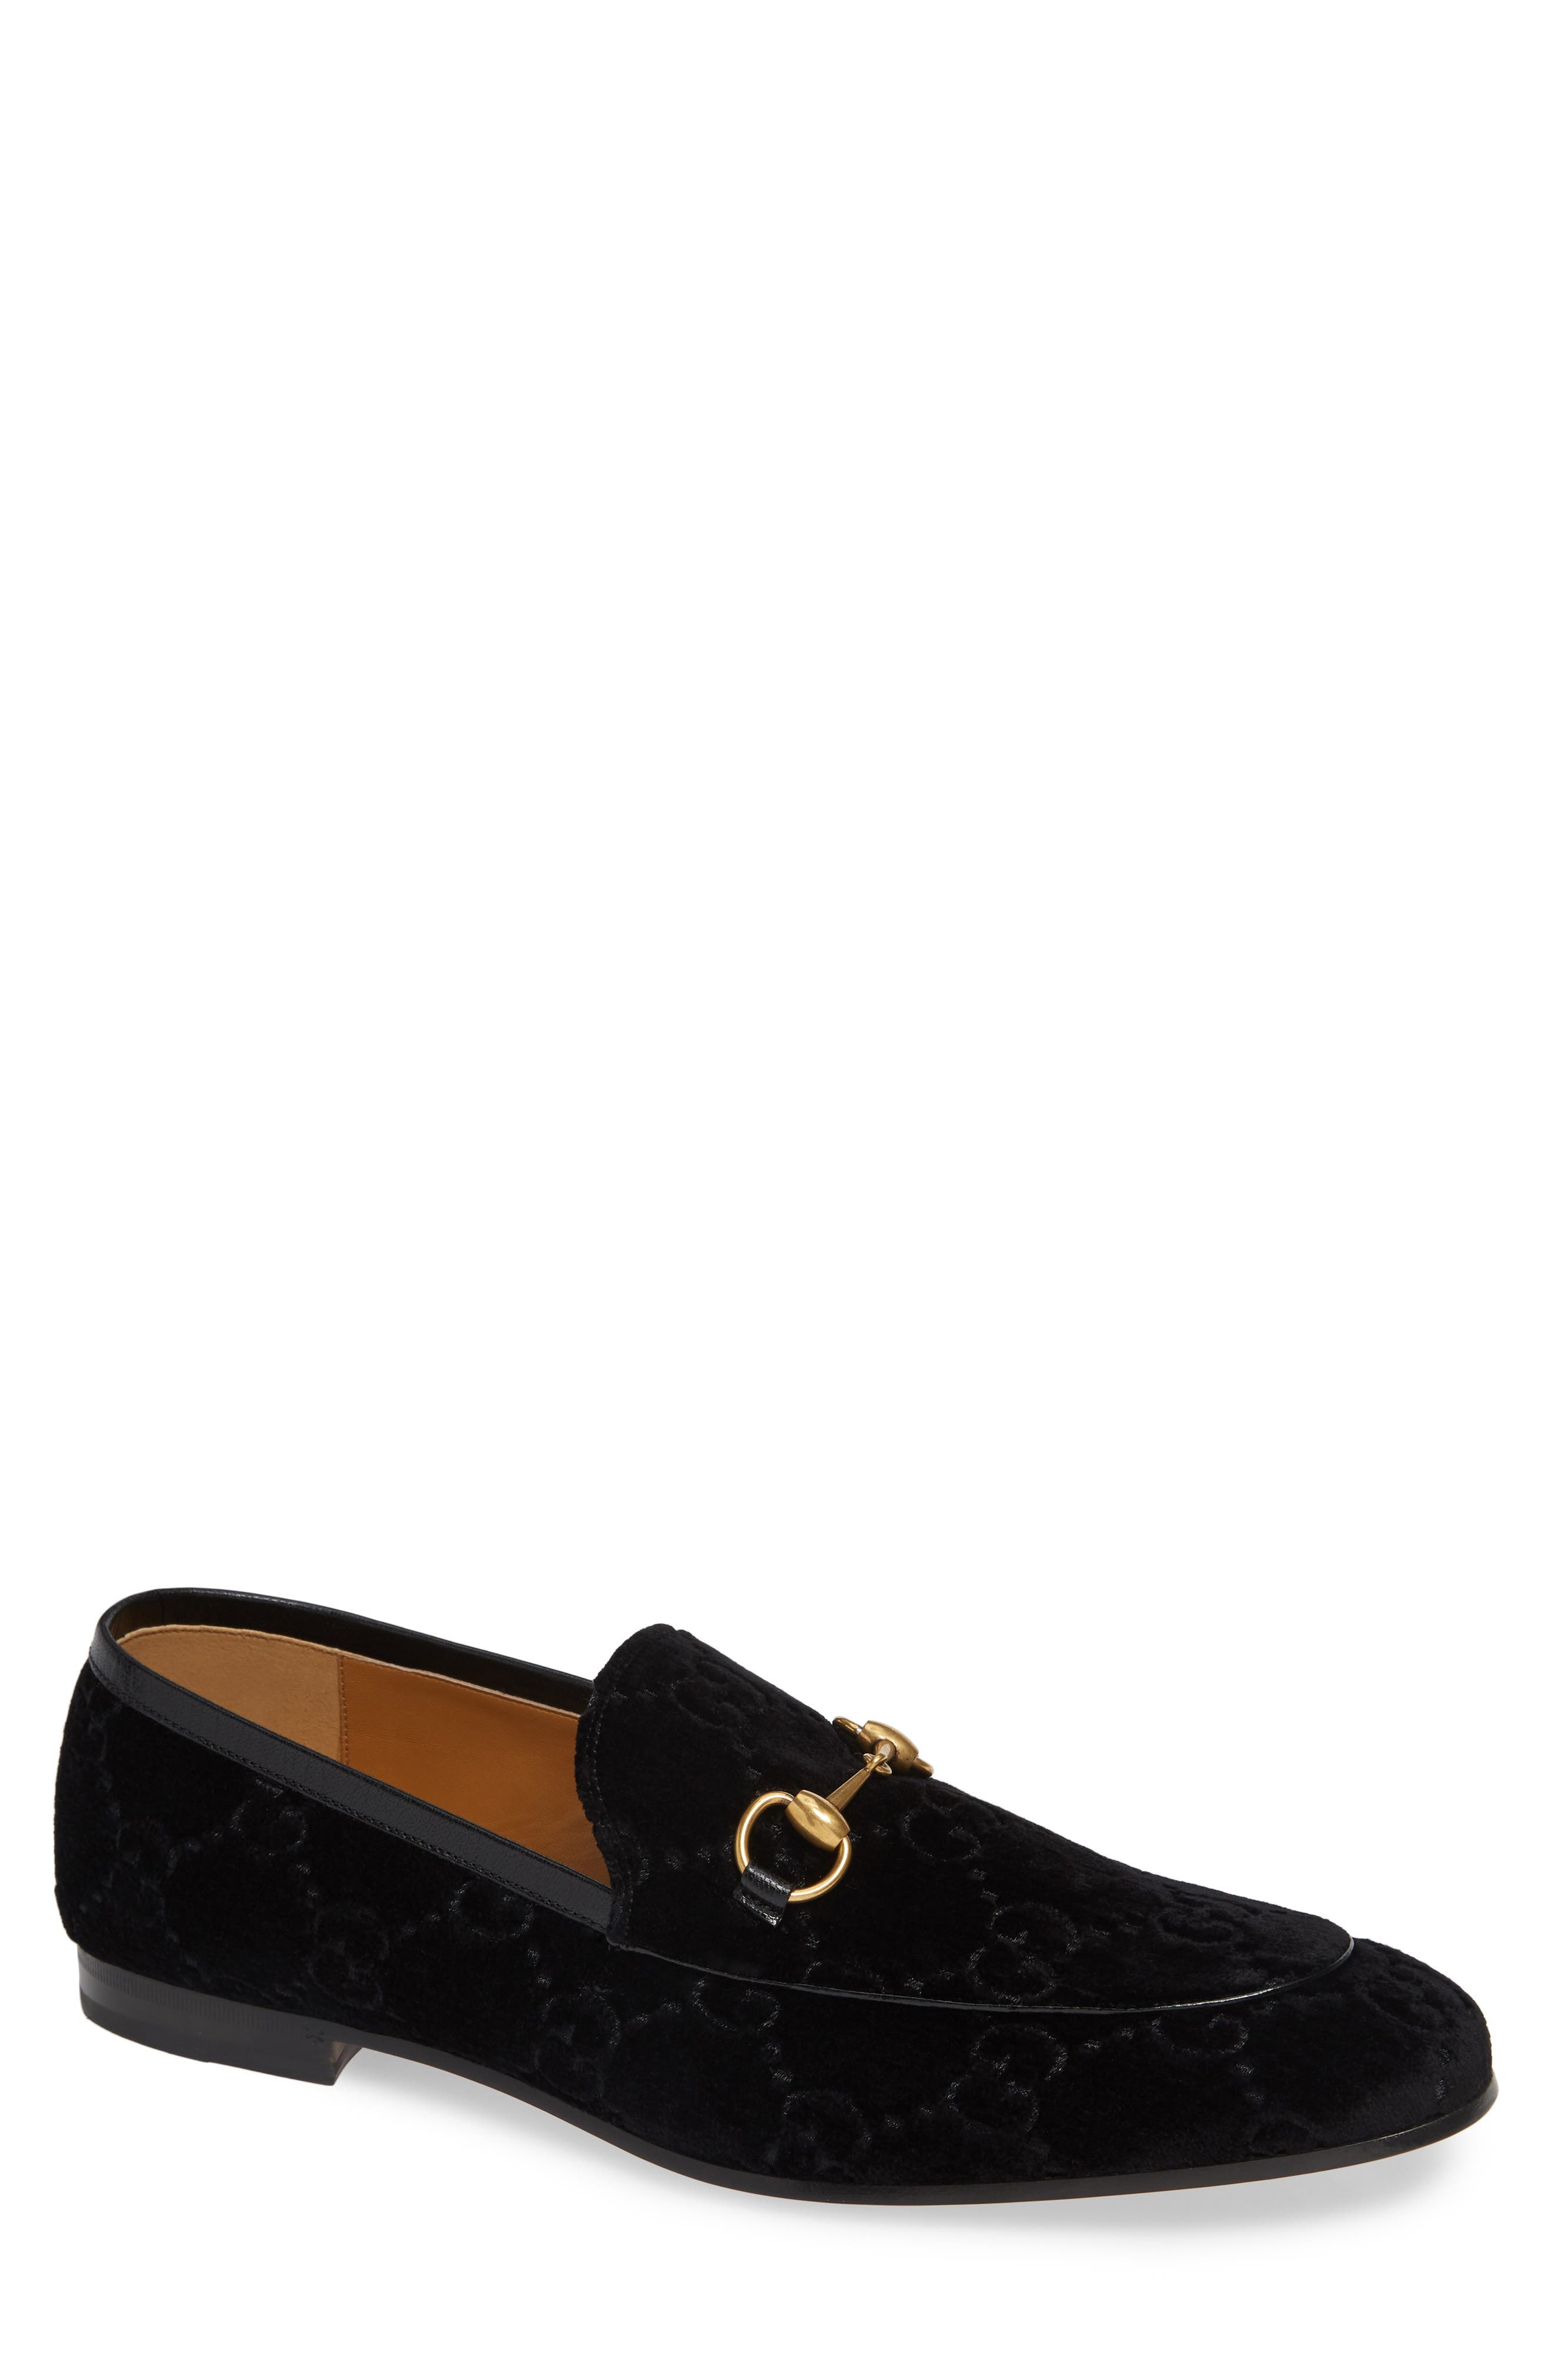 Jordaan GG Velvet Loafer,                         Main,                         color, NERO/ NERO